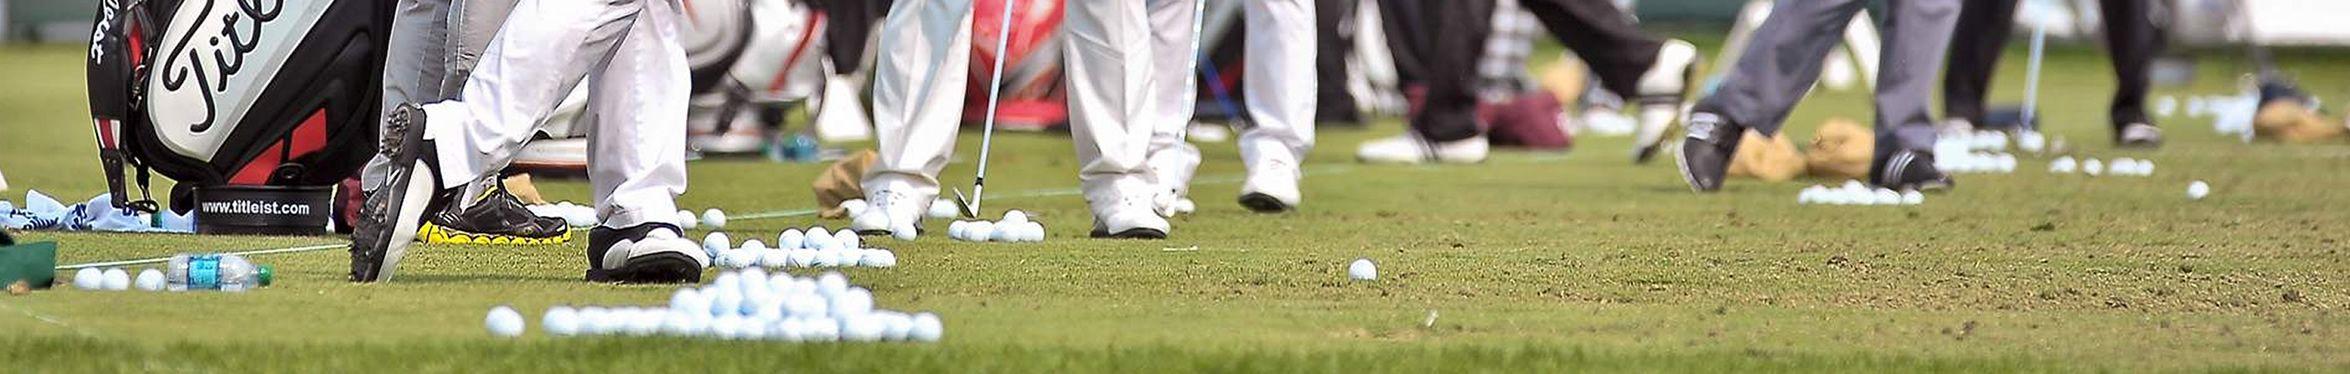 PGM Practice Golf